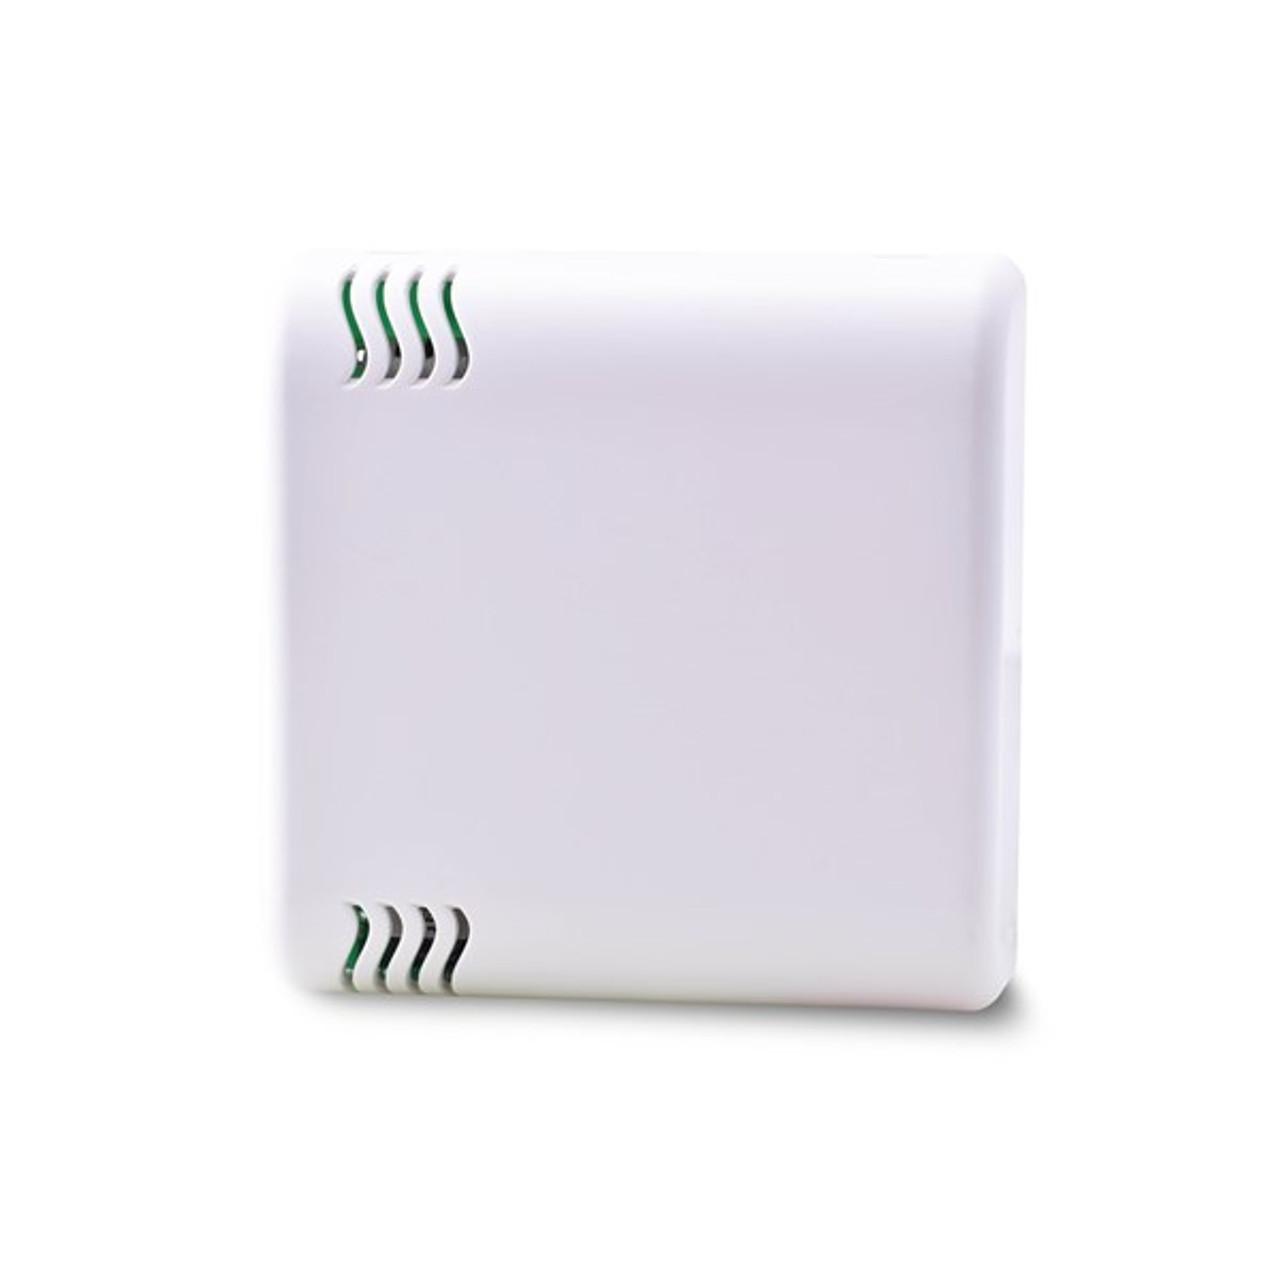 CMa11 Indoor temperature/humidity sensor M-Bus